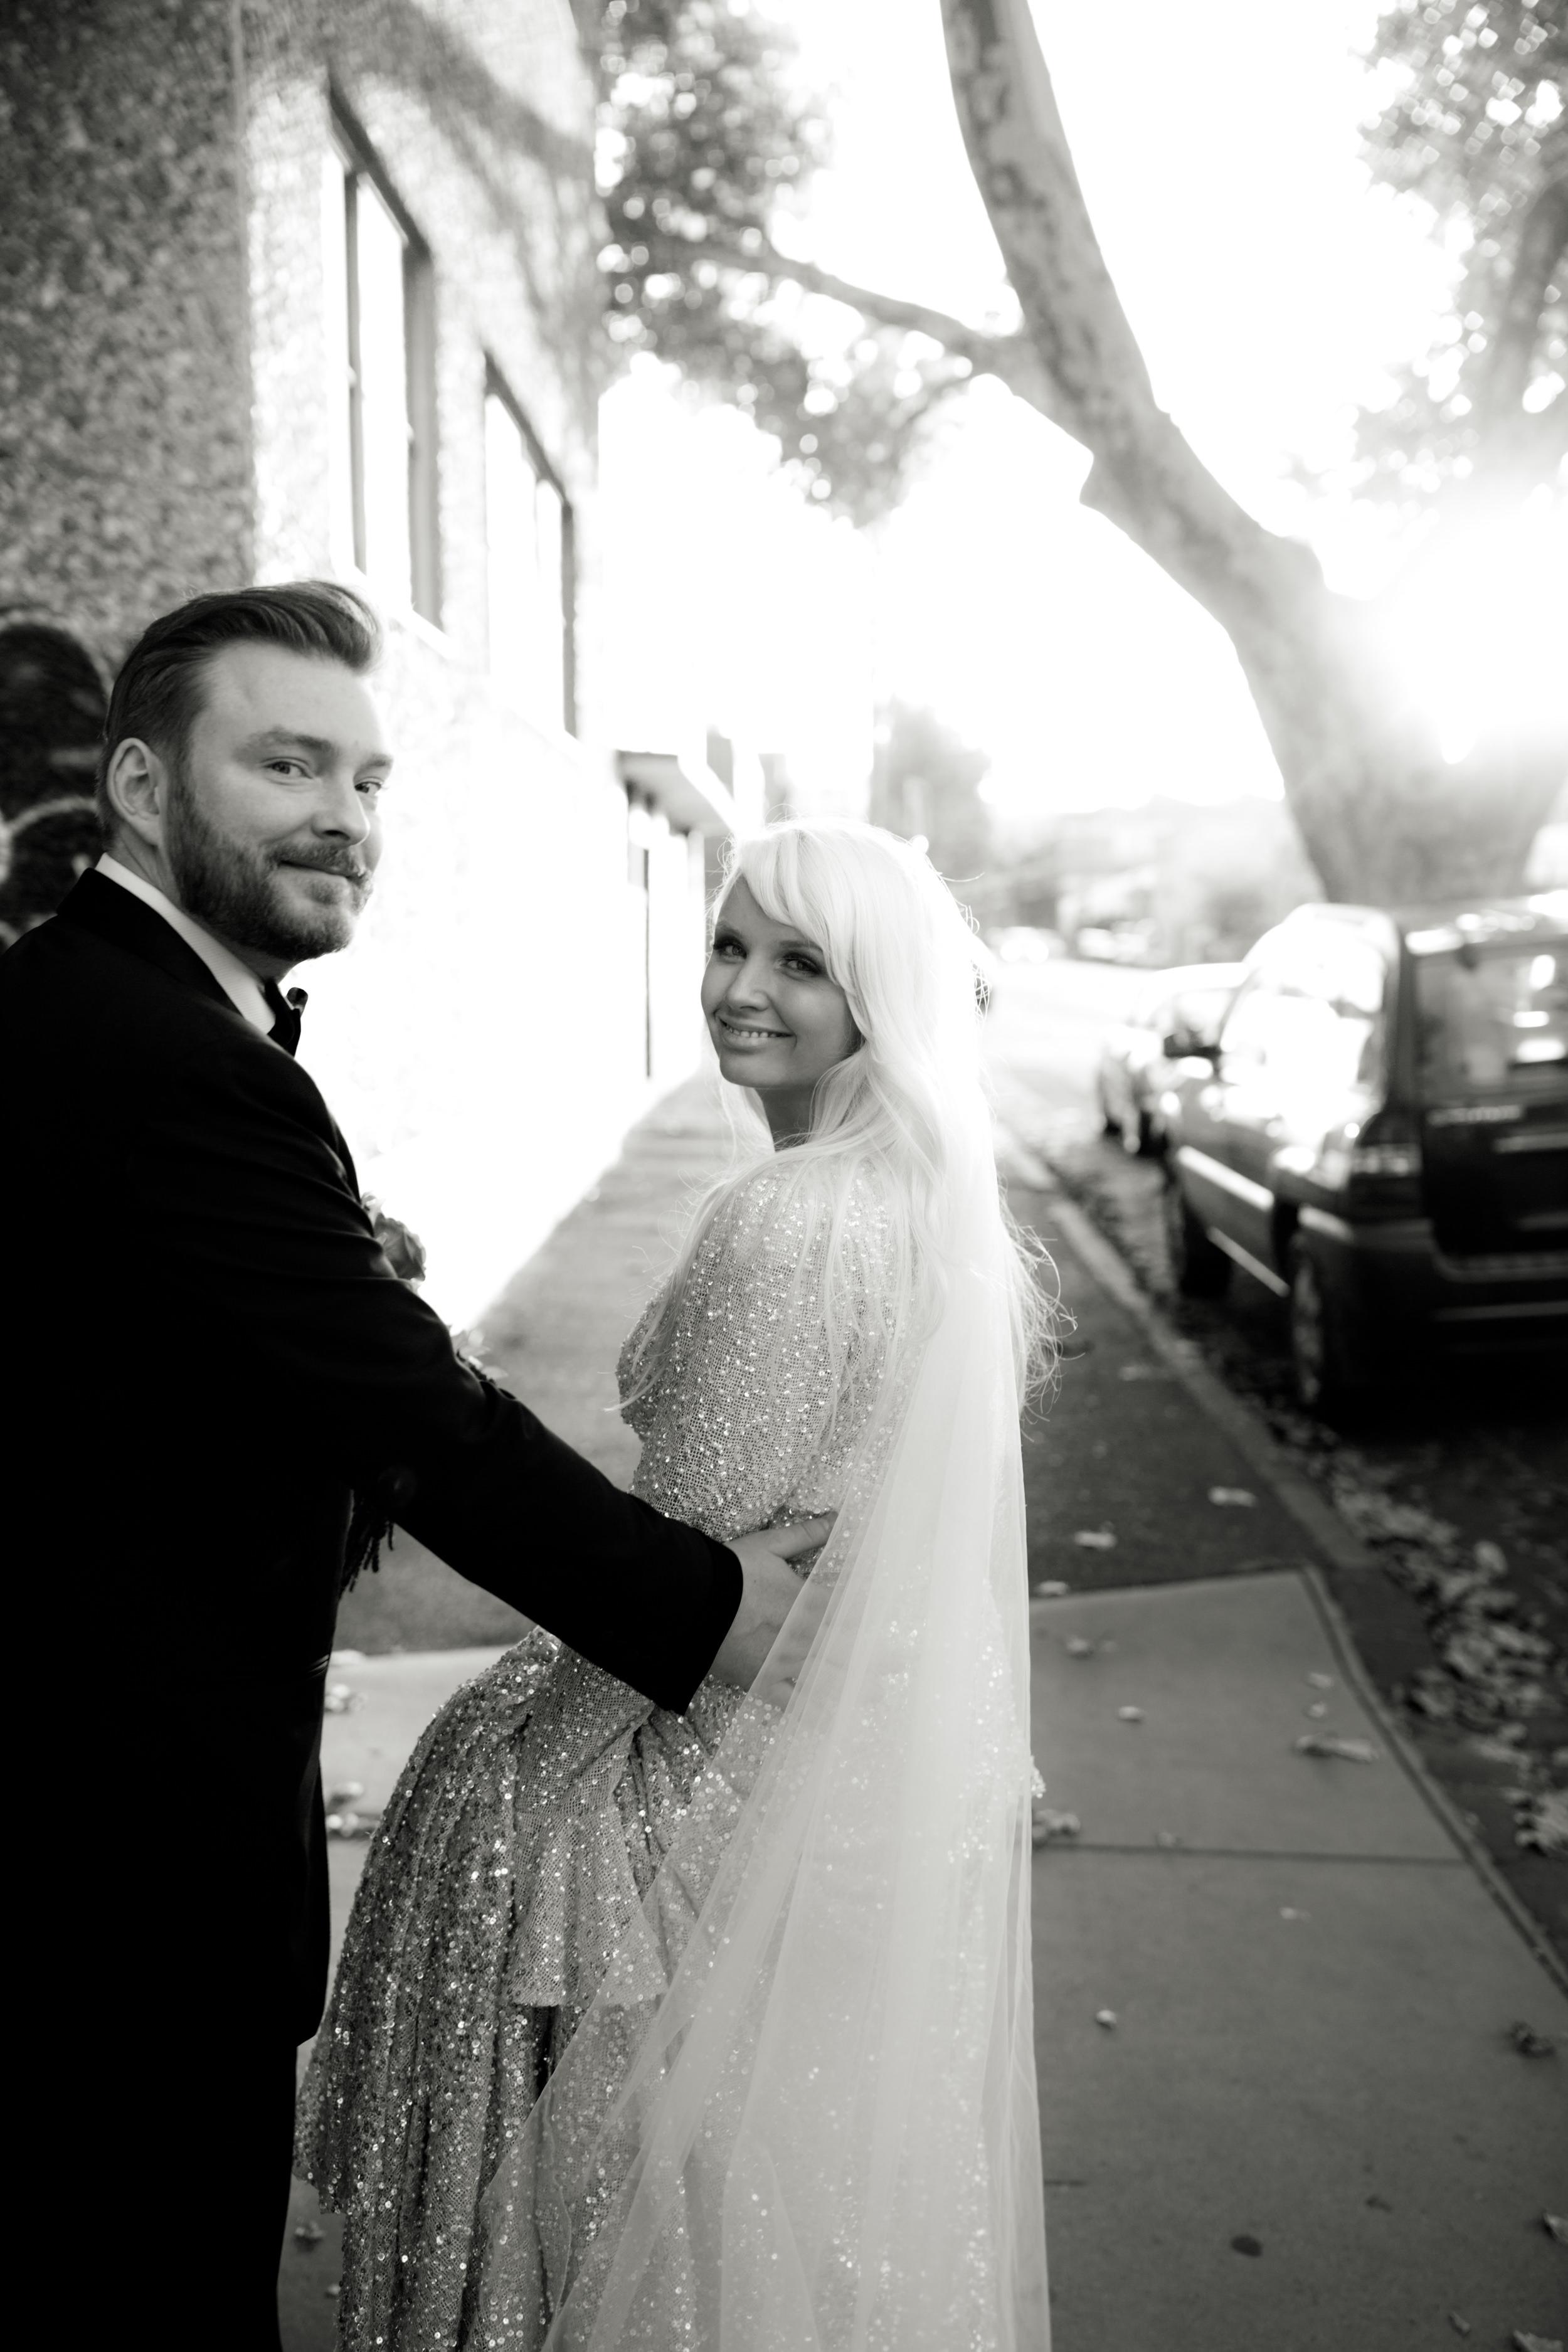 I-Got-You-Babe-Weddings-Tori-Will-Rupert0132.JPG